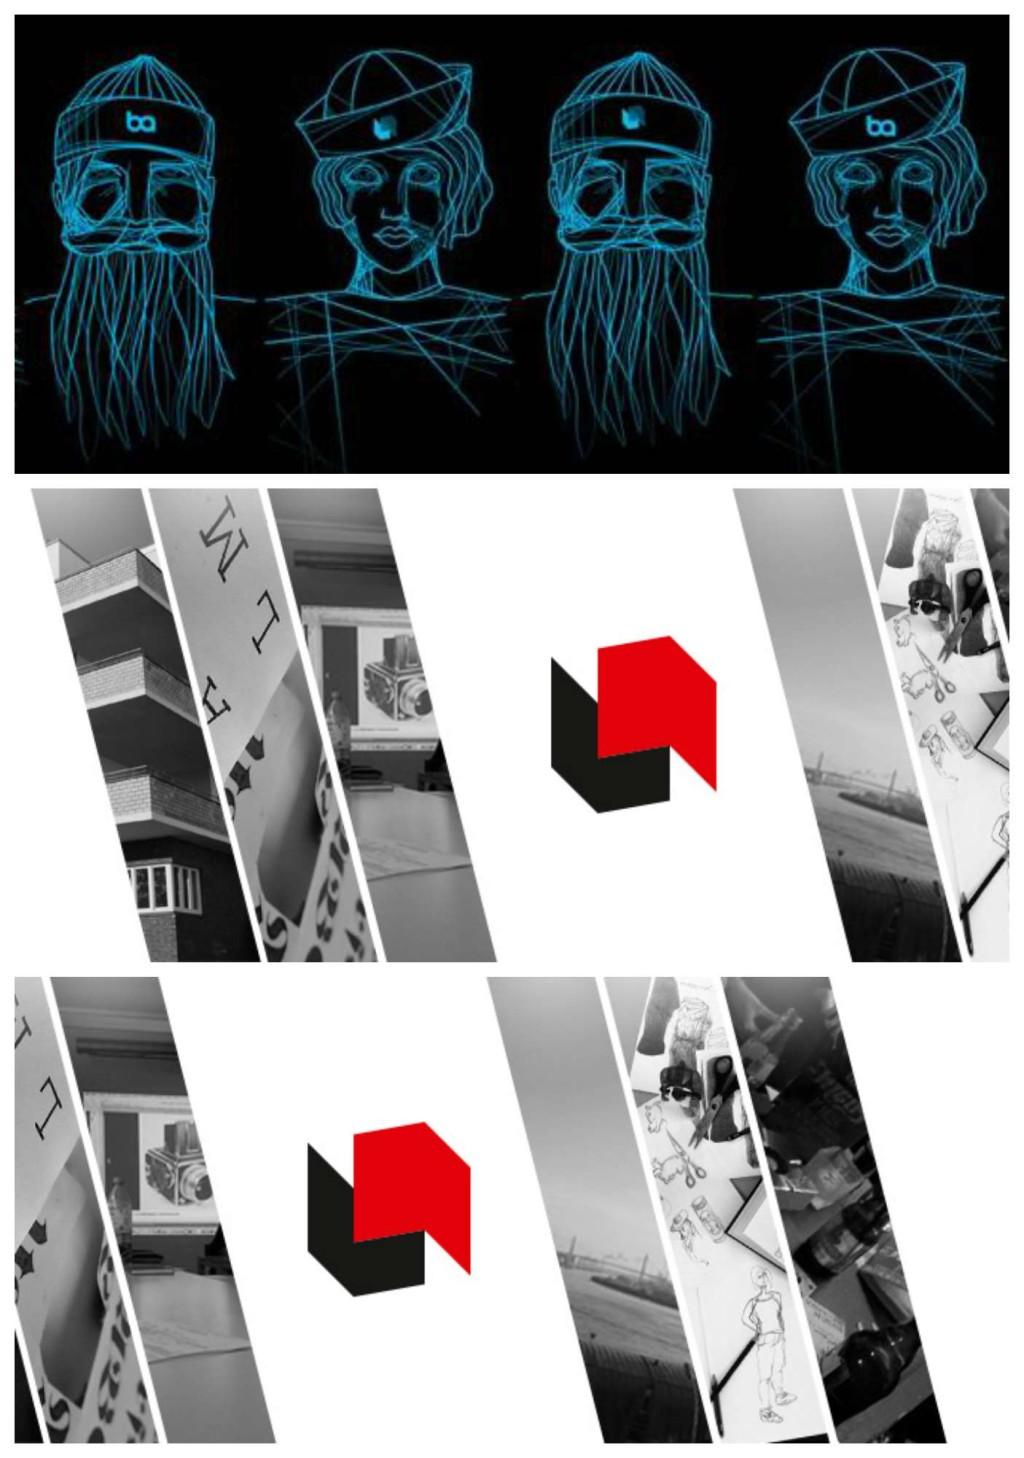 let s go and explore heute solltet ihr euch mal anschauen. Black Bedroom Furniture Sets. Home Design Ideas